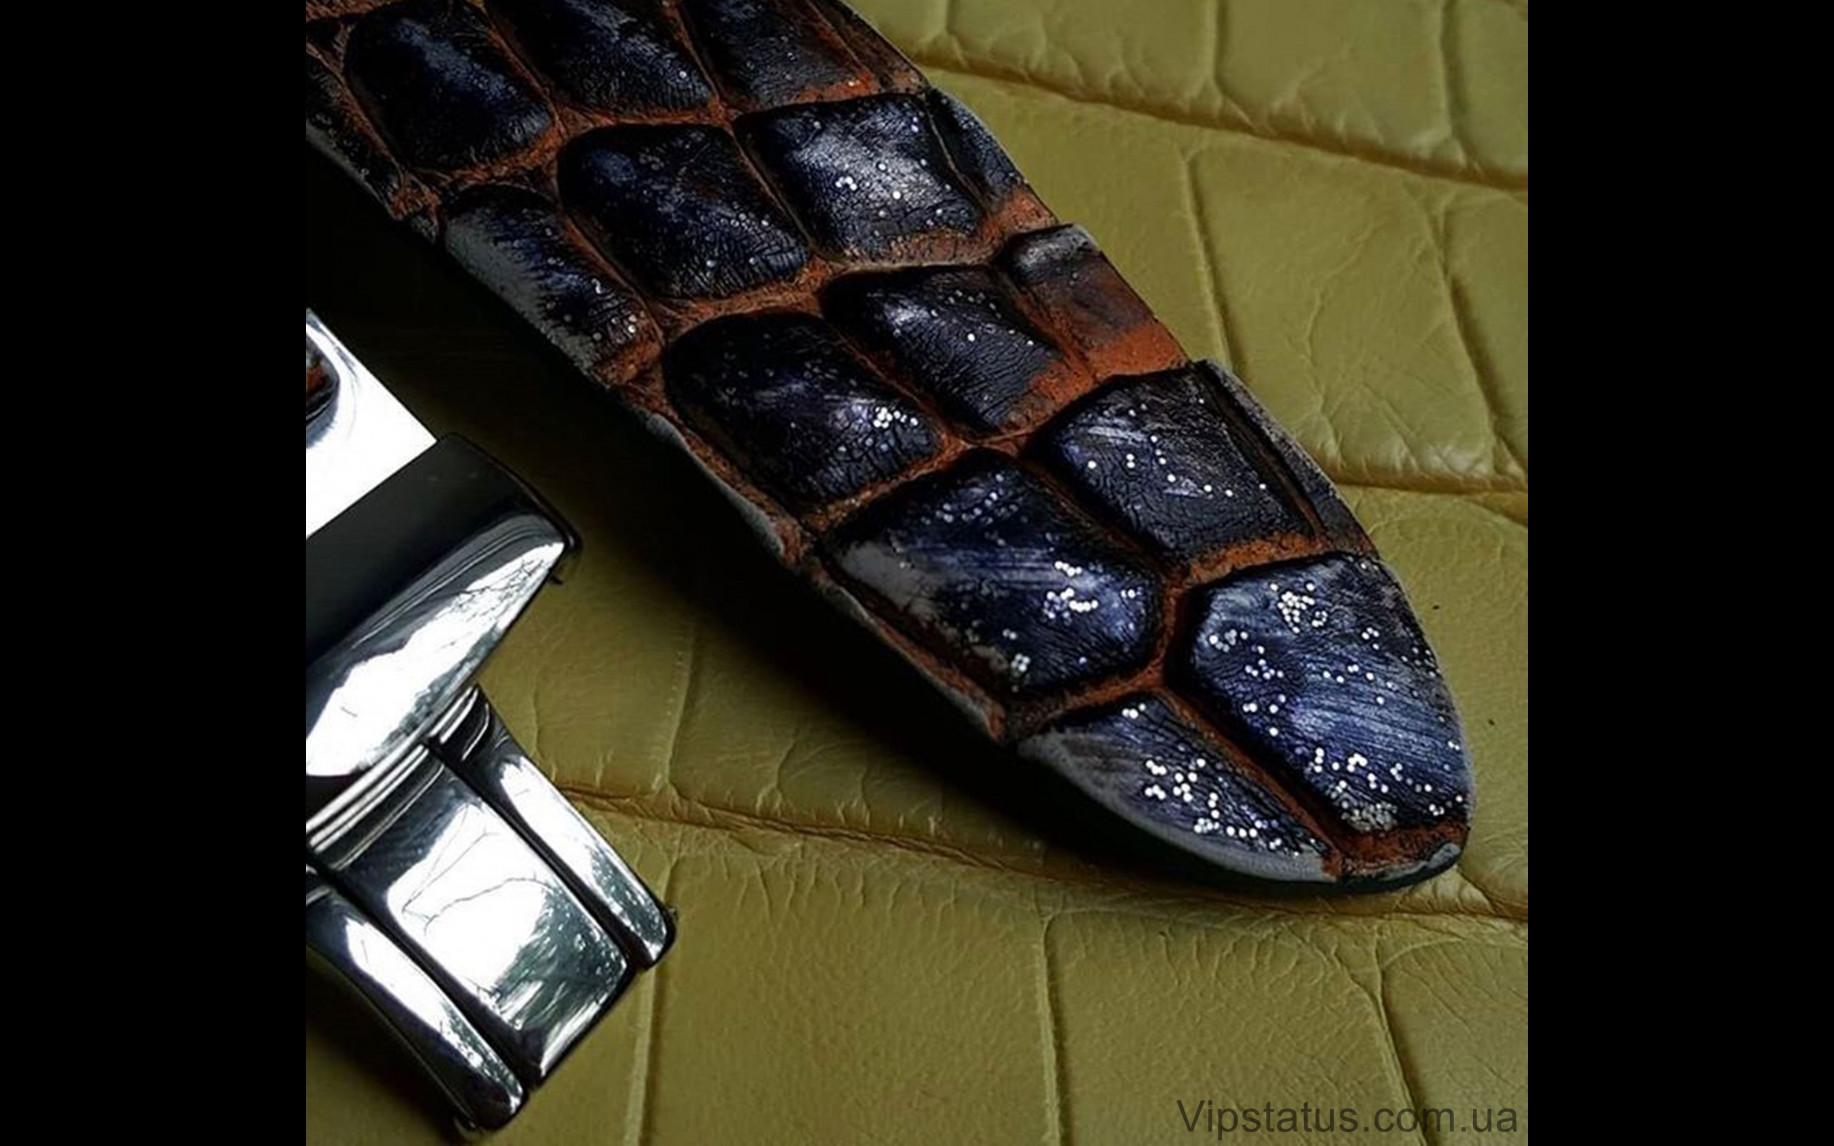 Elite Экзотический ремешок для часов Chopard кожа крокодила Exotic Crocodile Strap for Chopard watches image 3